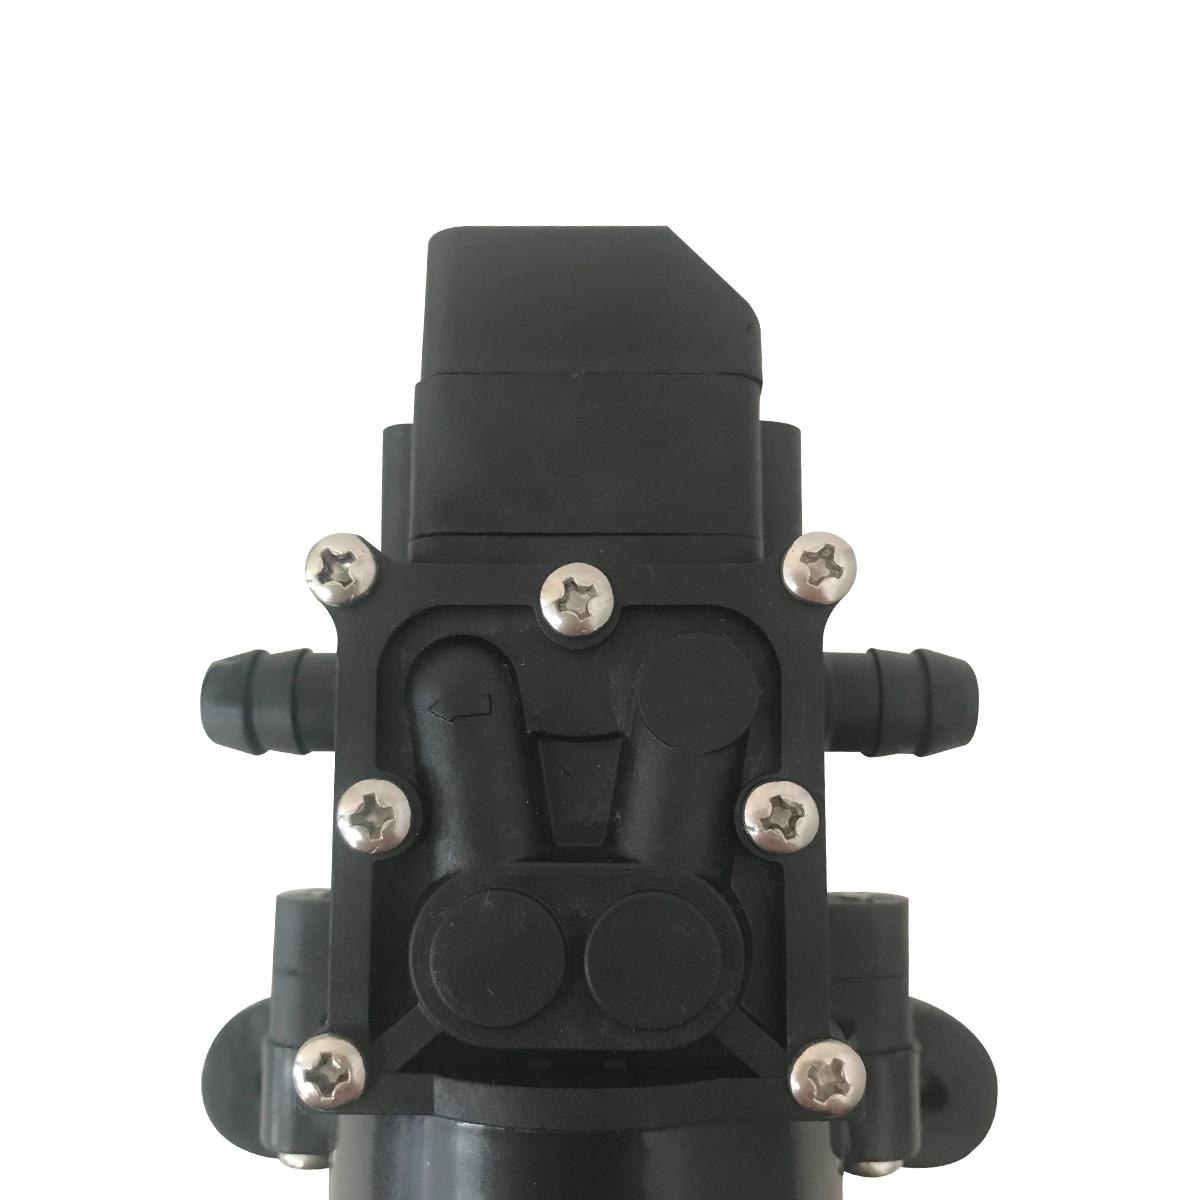 Kit Bomba Diafragma 12v 100psi e Filtro De Sucção